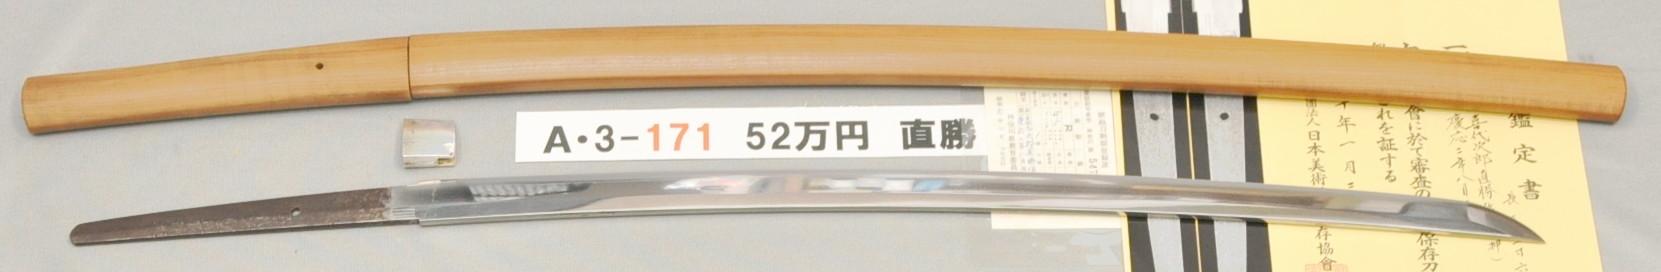 A3171